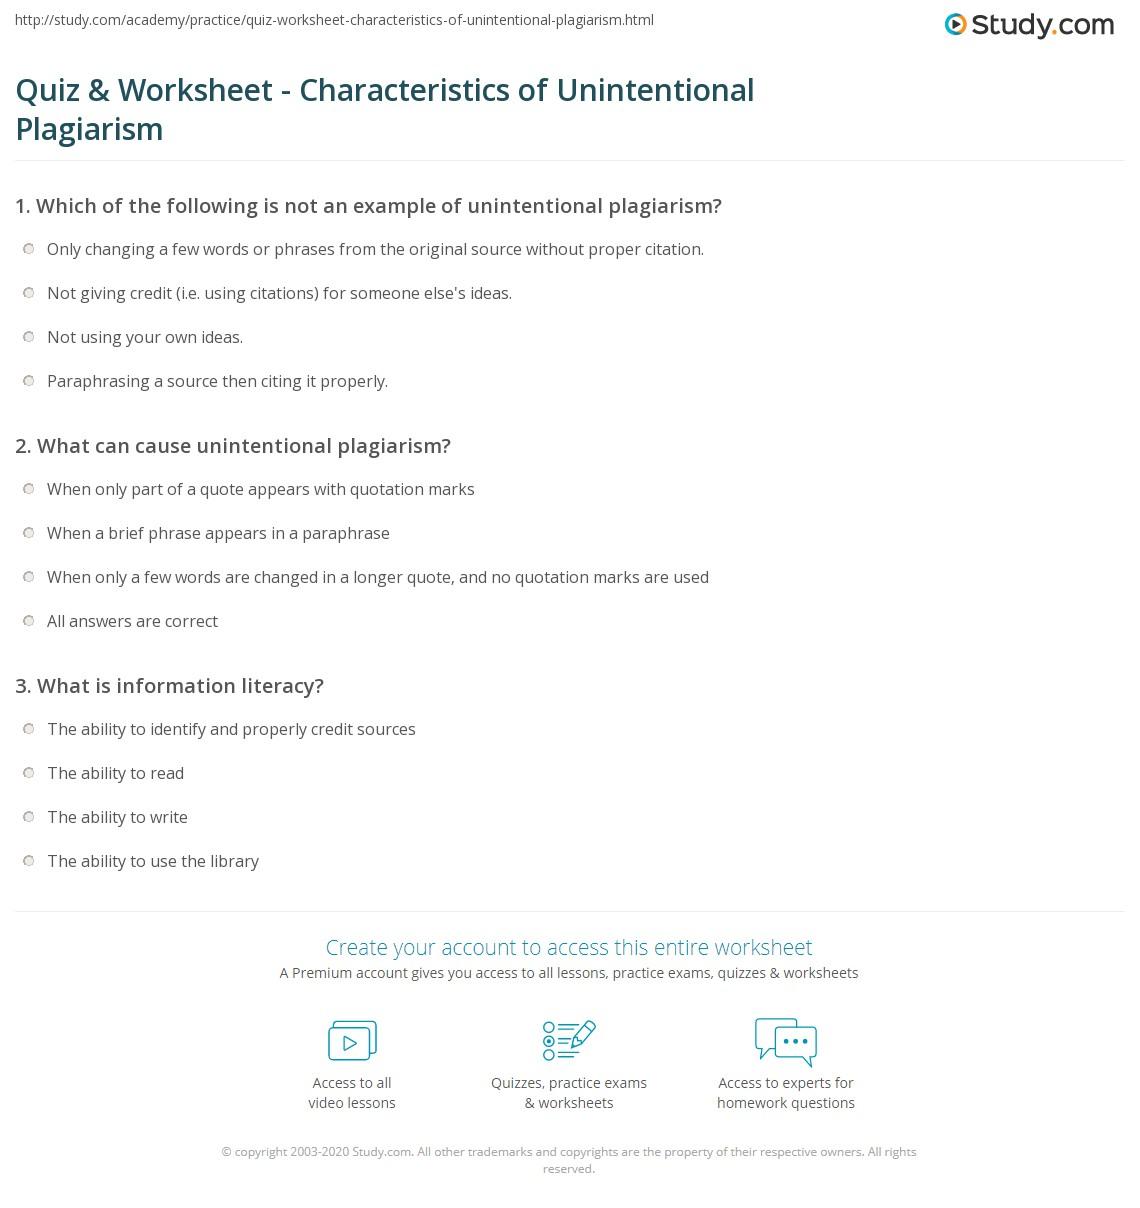 Quiz Worksheet Characteristics Of Unintentional Plagiarism